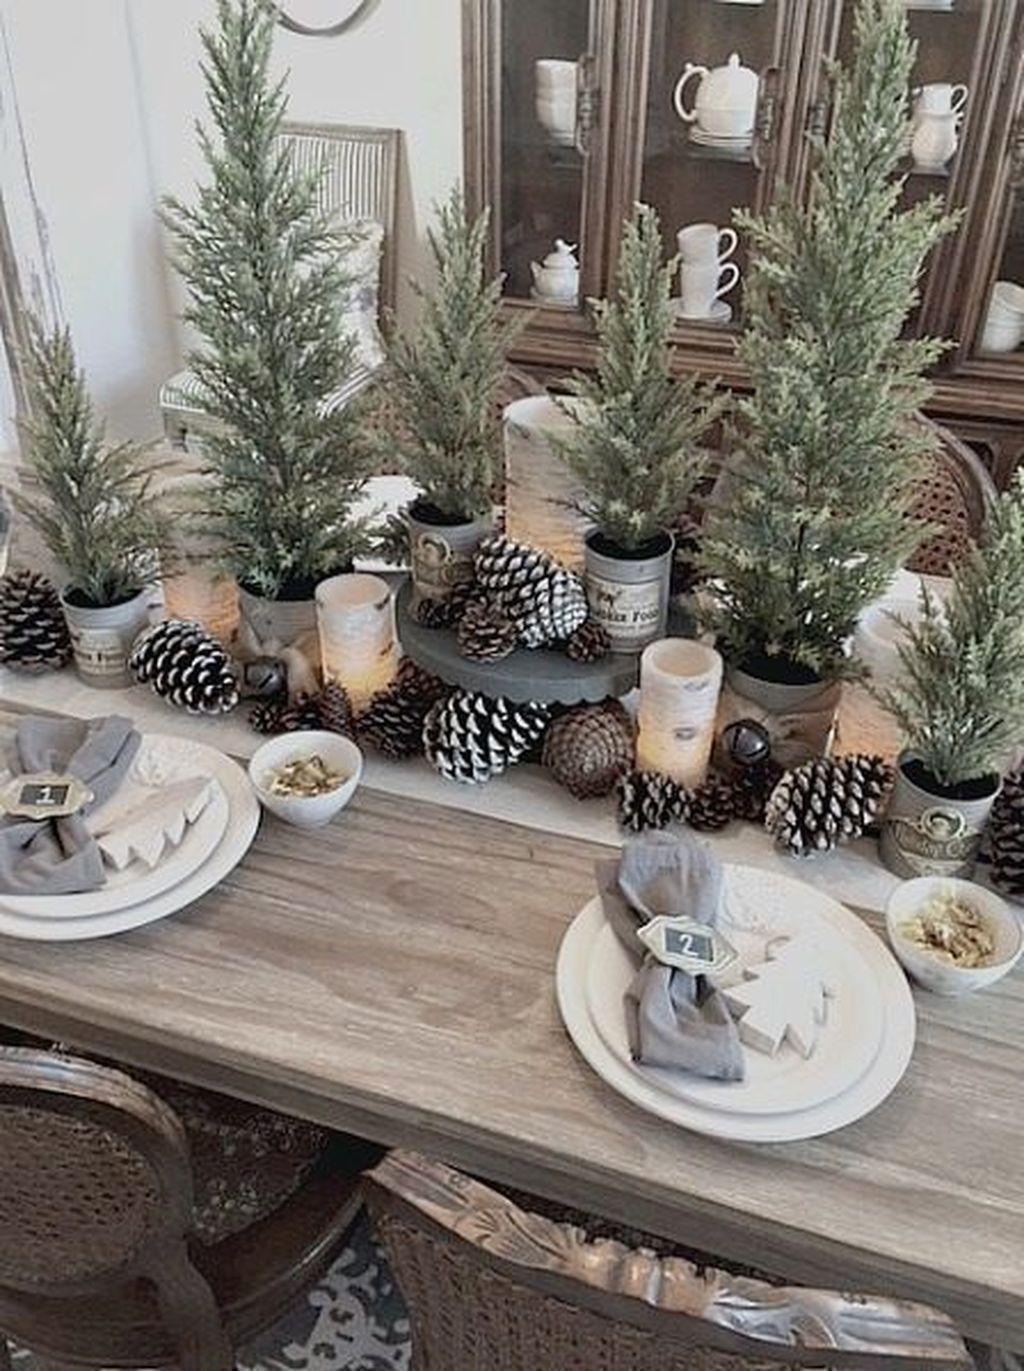 30 Pretty Christmas Decor Ideas For Your Home Farmhouse